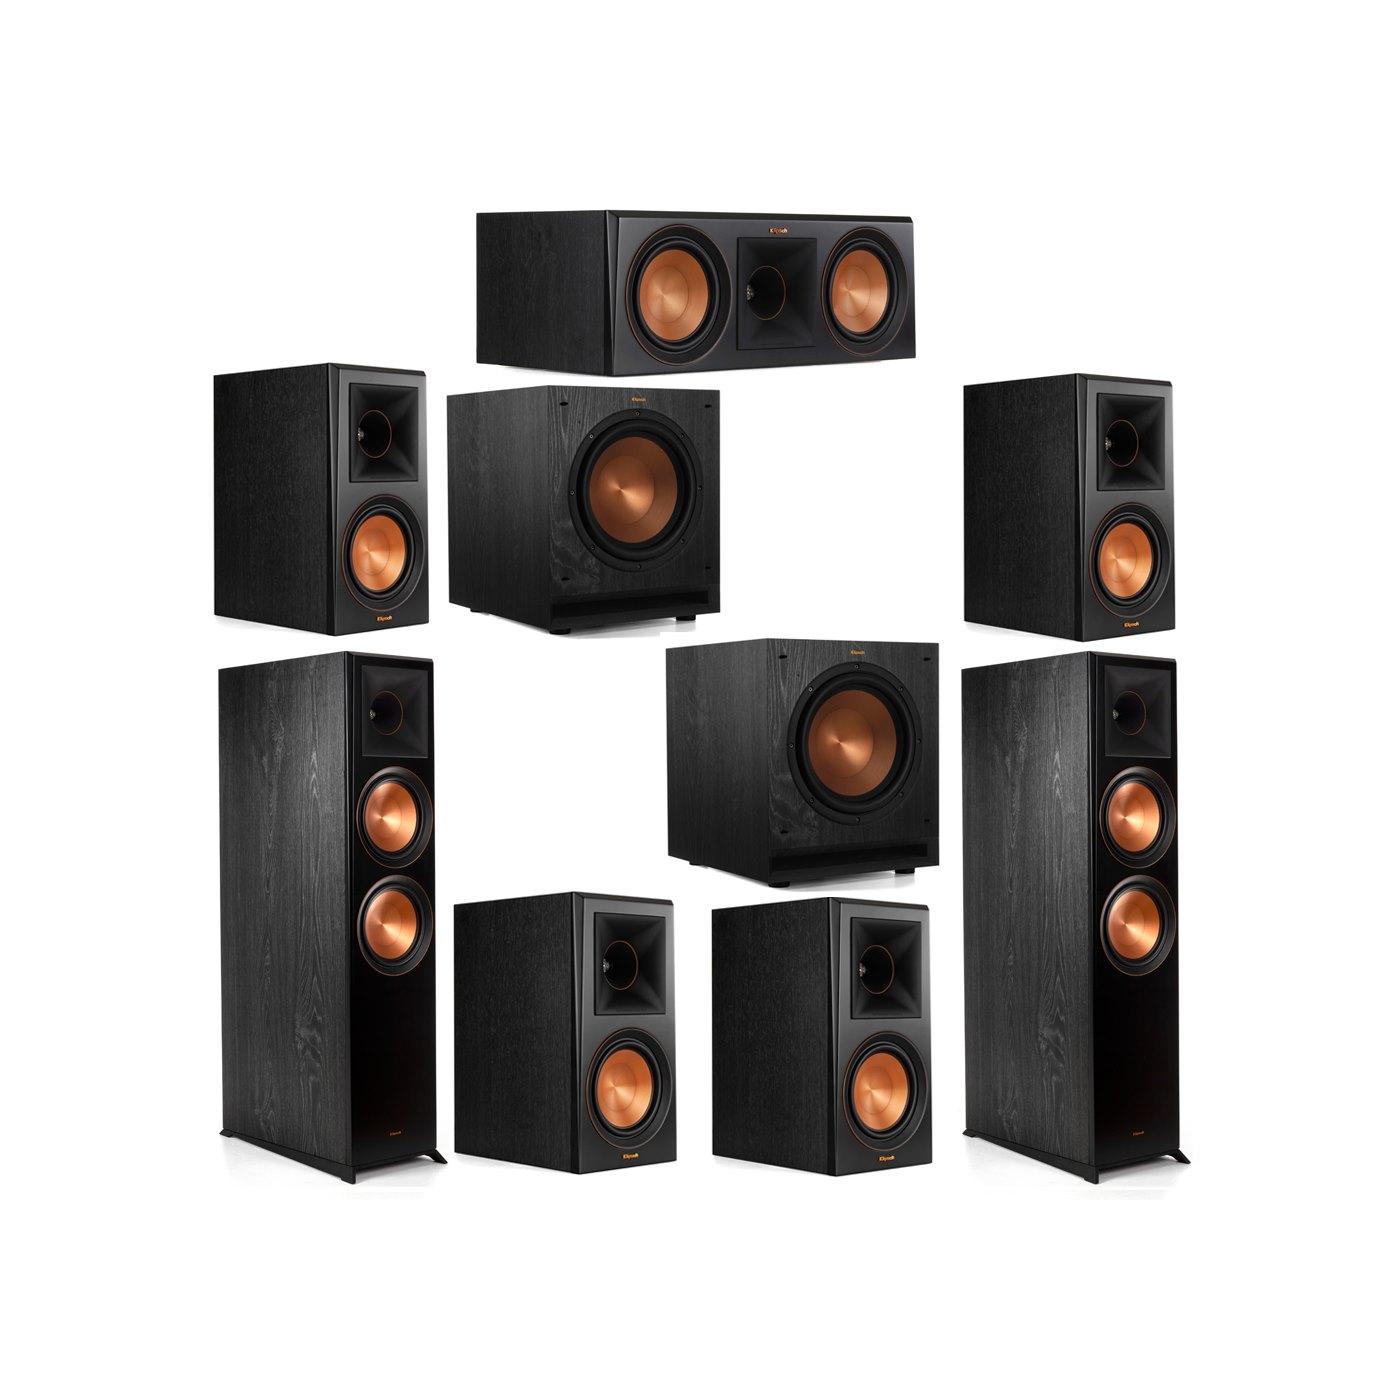 Klipsch 7.2 System with 2 RP-8000F Floorstanding Speakers, 1 Klipsch RP-600C Center Speaker, 4 Klipsch RP-600M Surround Speakers, 2 Klipsch SPL-100 Subwoofers